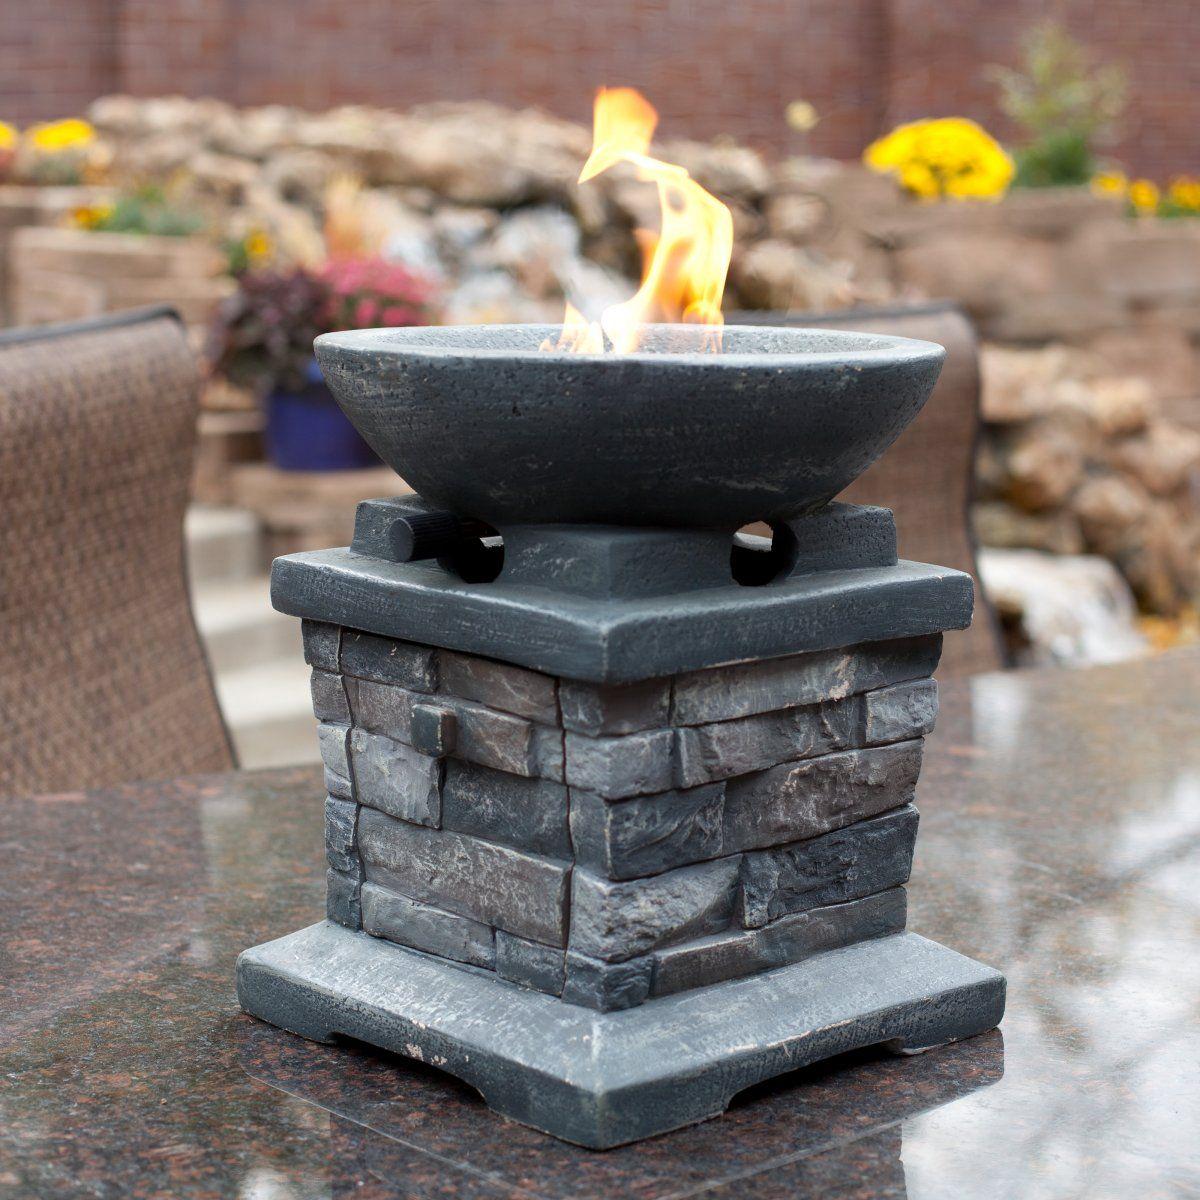 Coronado Propane Tabletop Fire Bowl